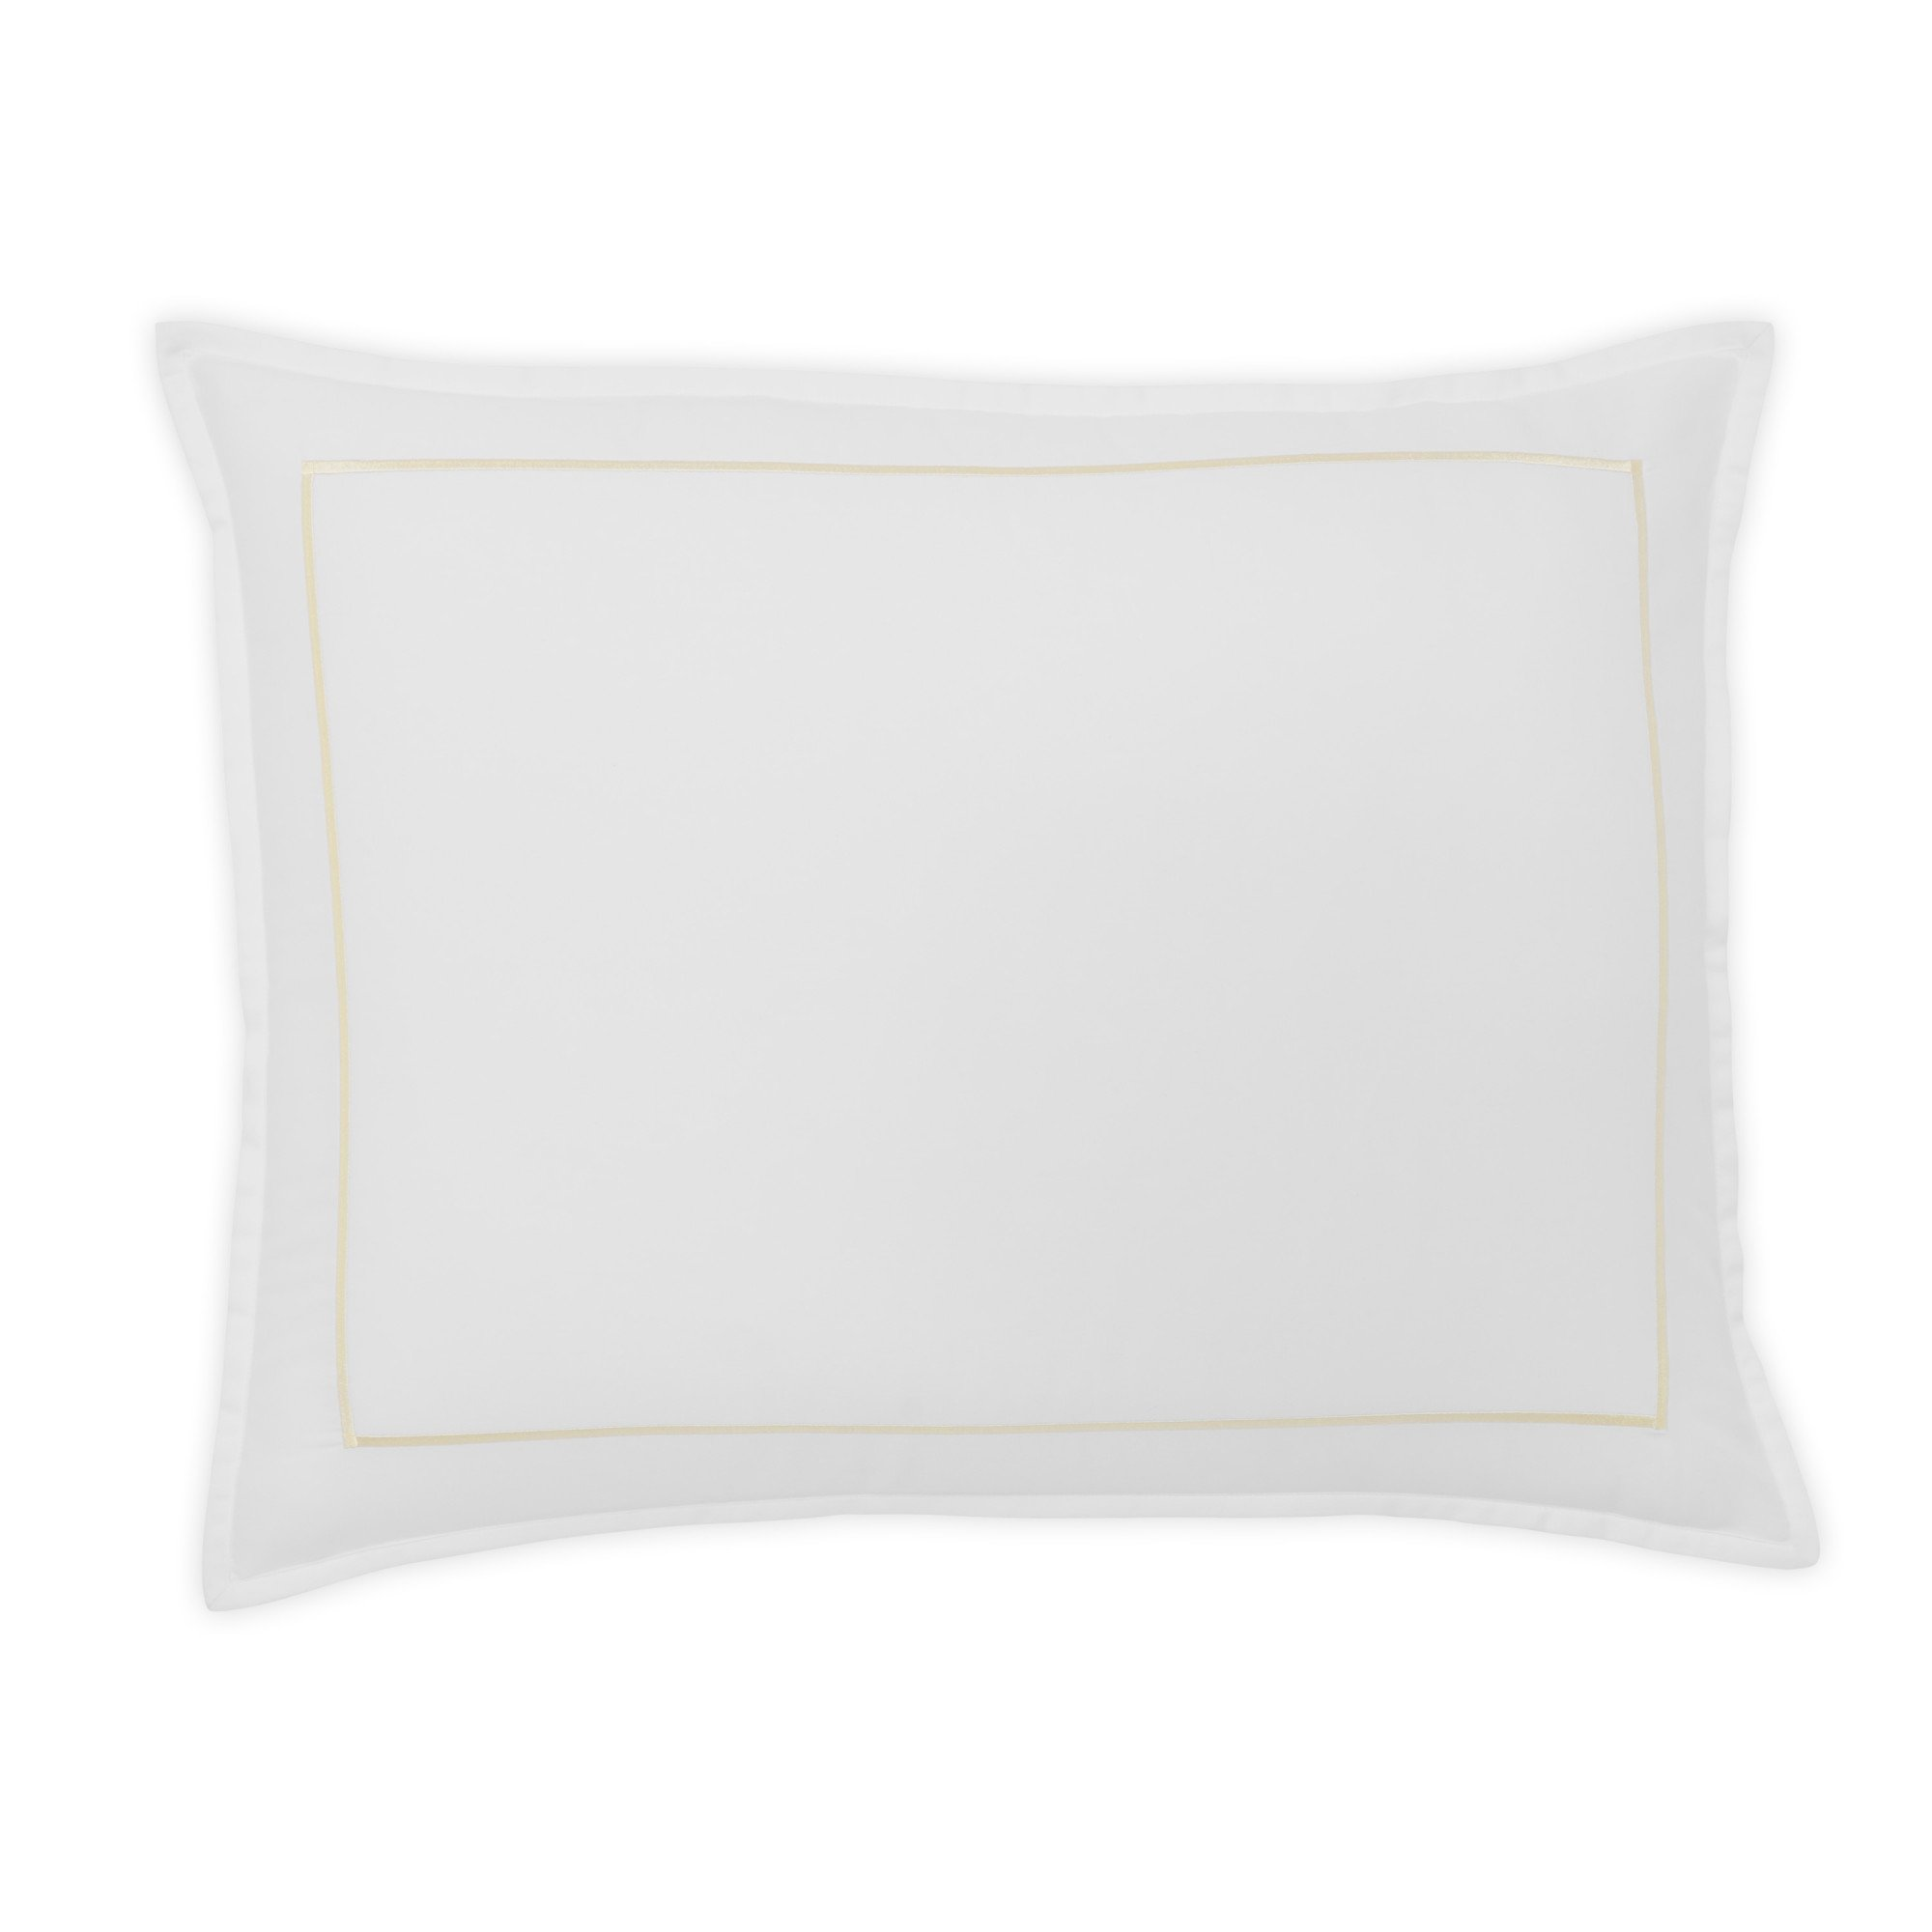 FlatIron Hotel Satin Stitch Sham, Standard, White/Ivory